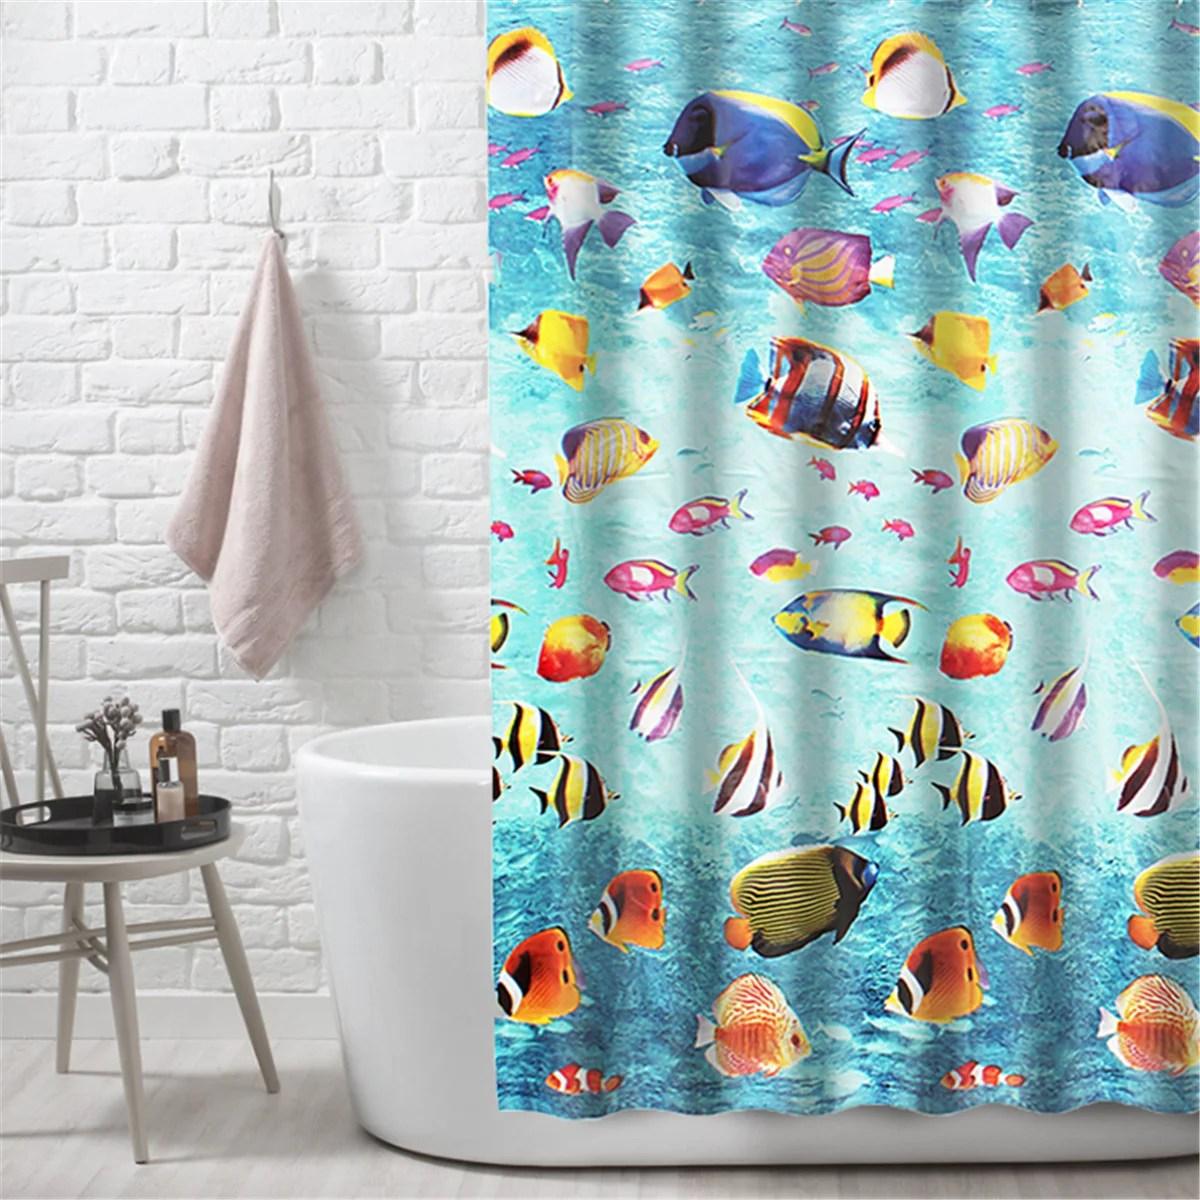 underwater shower curtain ocean transparent underwater landscape with tropical fish eva clear plastic bathroom shower curtain mildew resistant